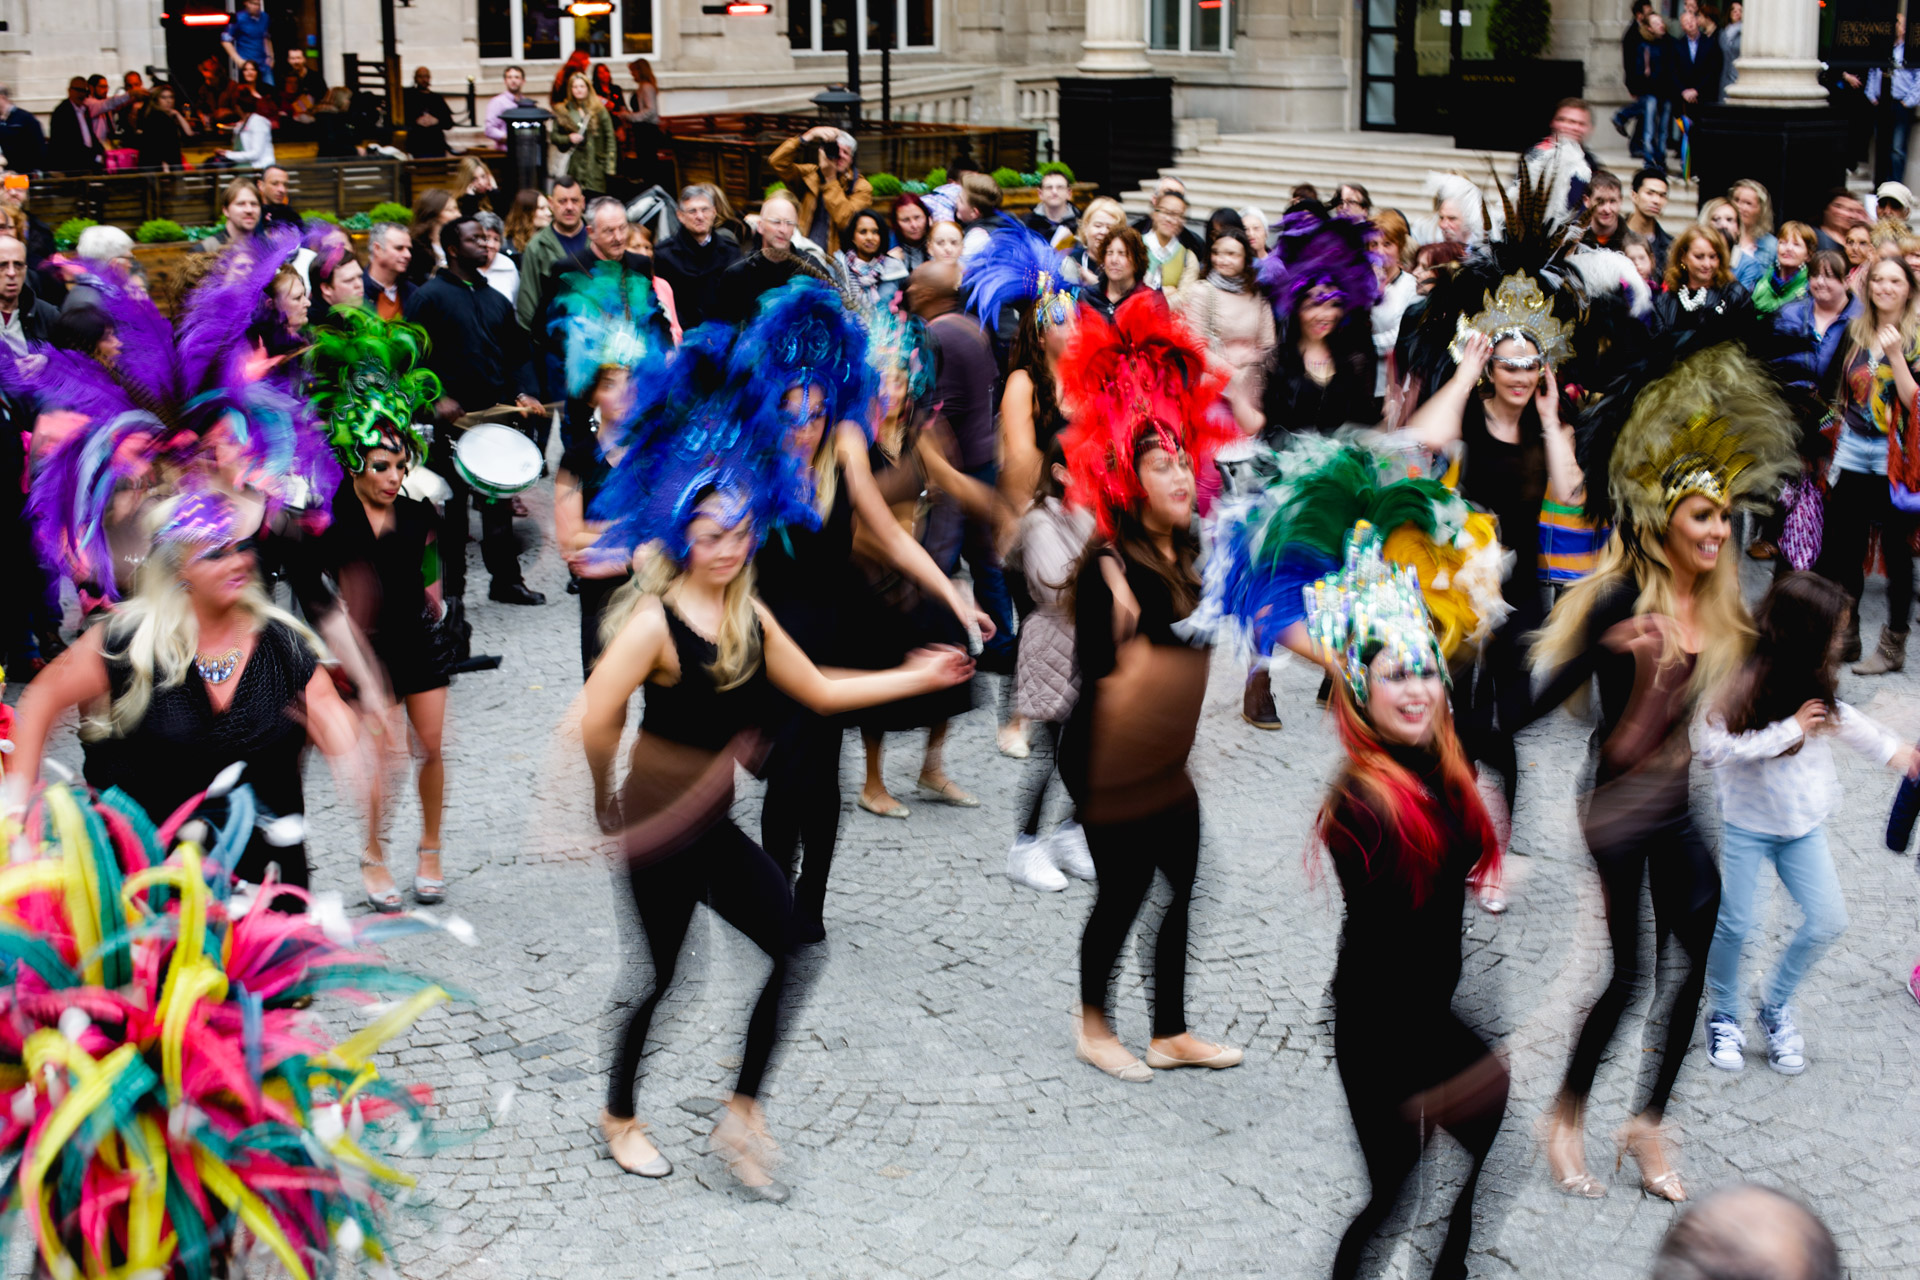 Liverpool Light Night 2015 Samba Dance Exchange Flags Andrew Wilson Photography